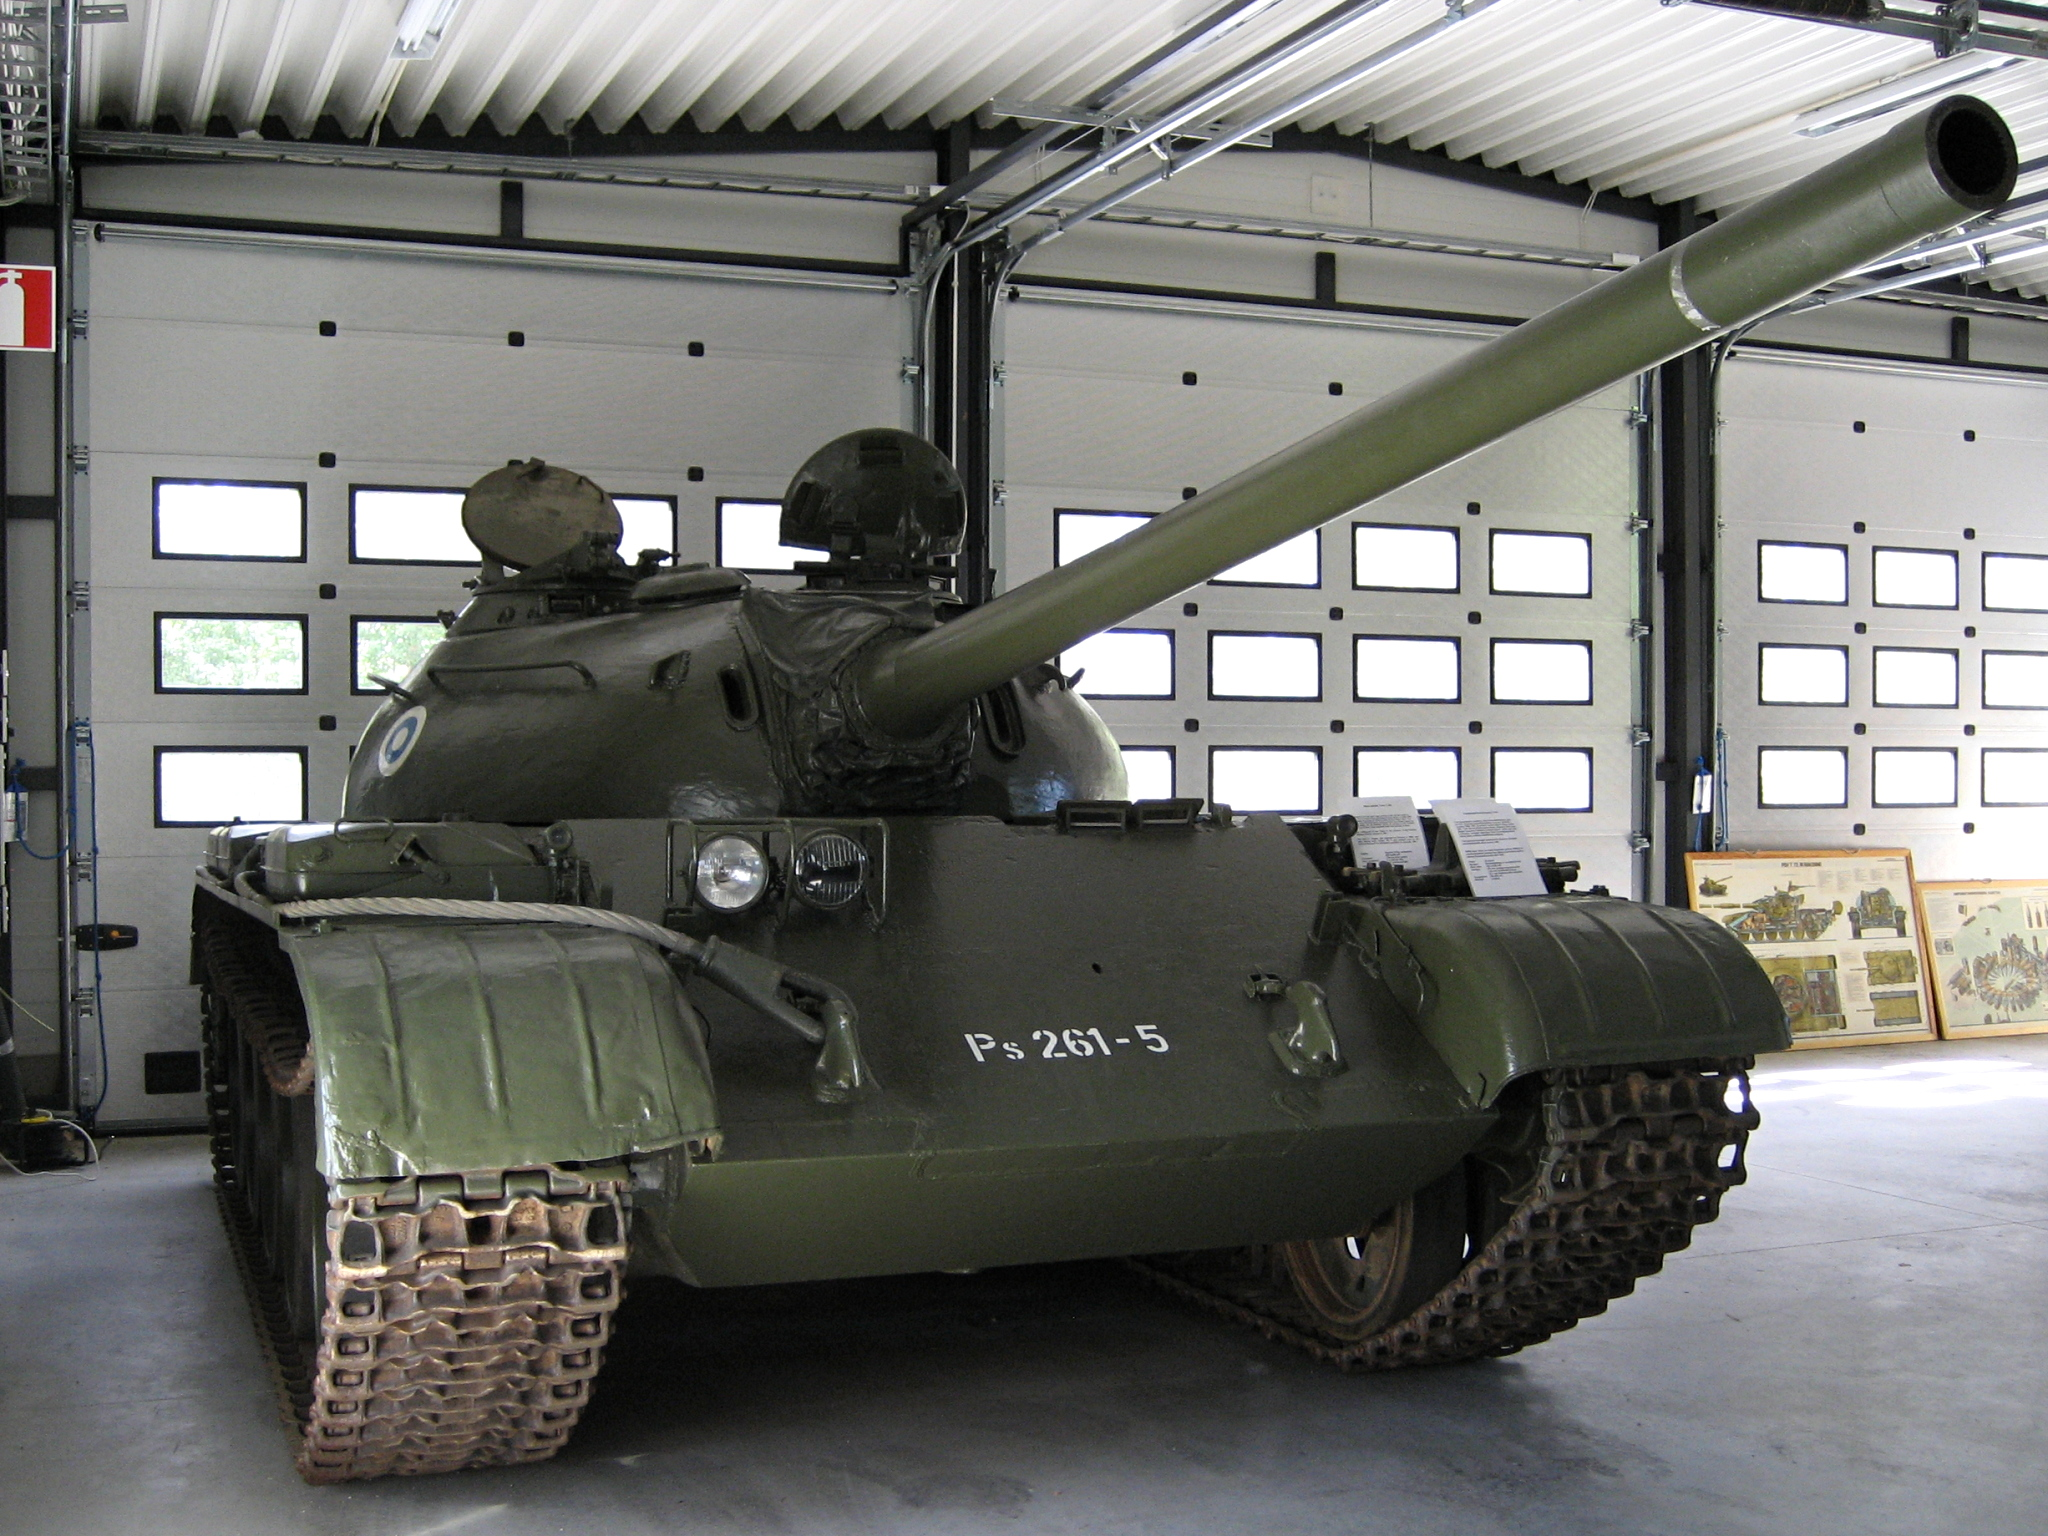 Parola_Armoured_Vehicle_Museum_Hattula_F